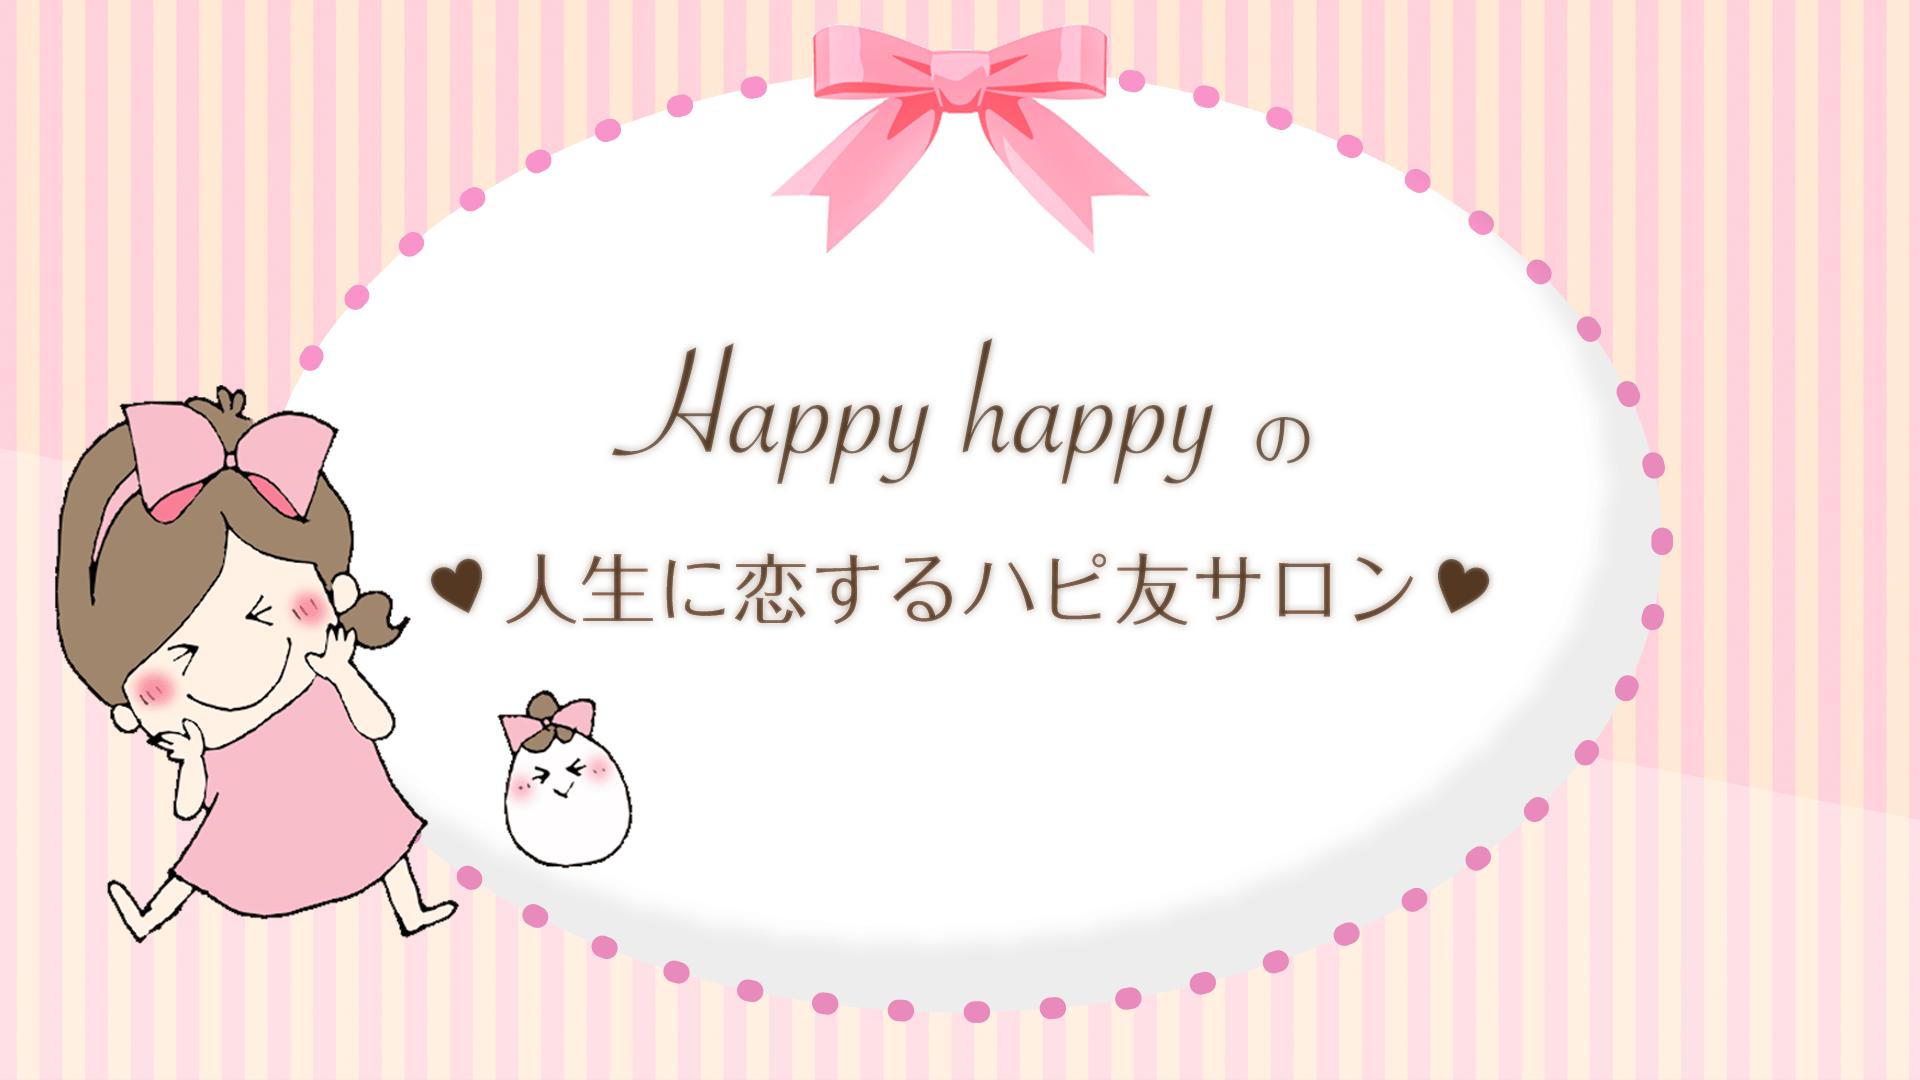 Happyhappy - Happyhappyの♡人生に恋するハピ友サロン♡ - DMM オンラインサロン